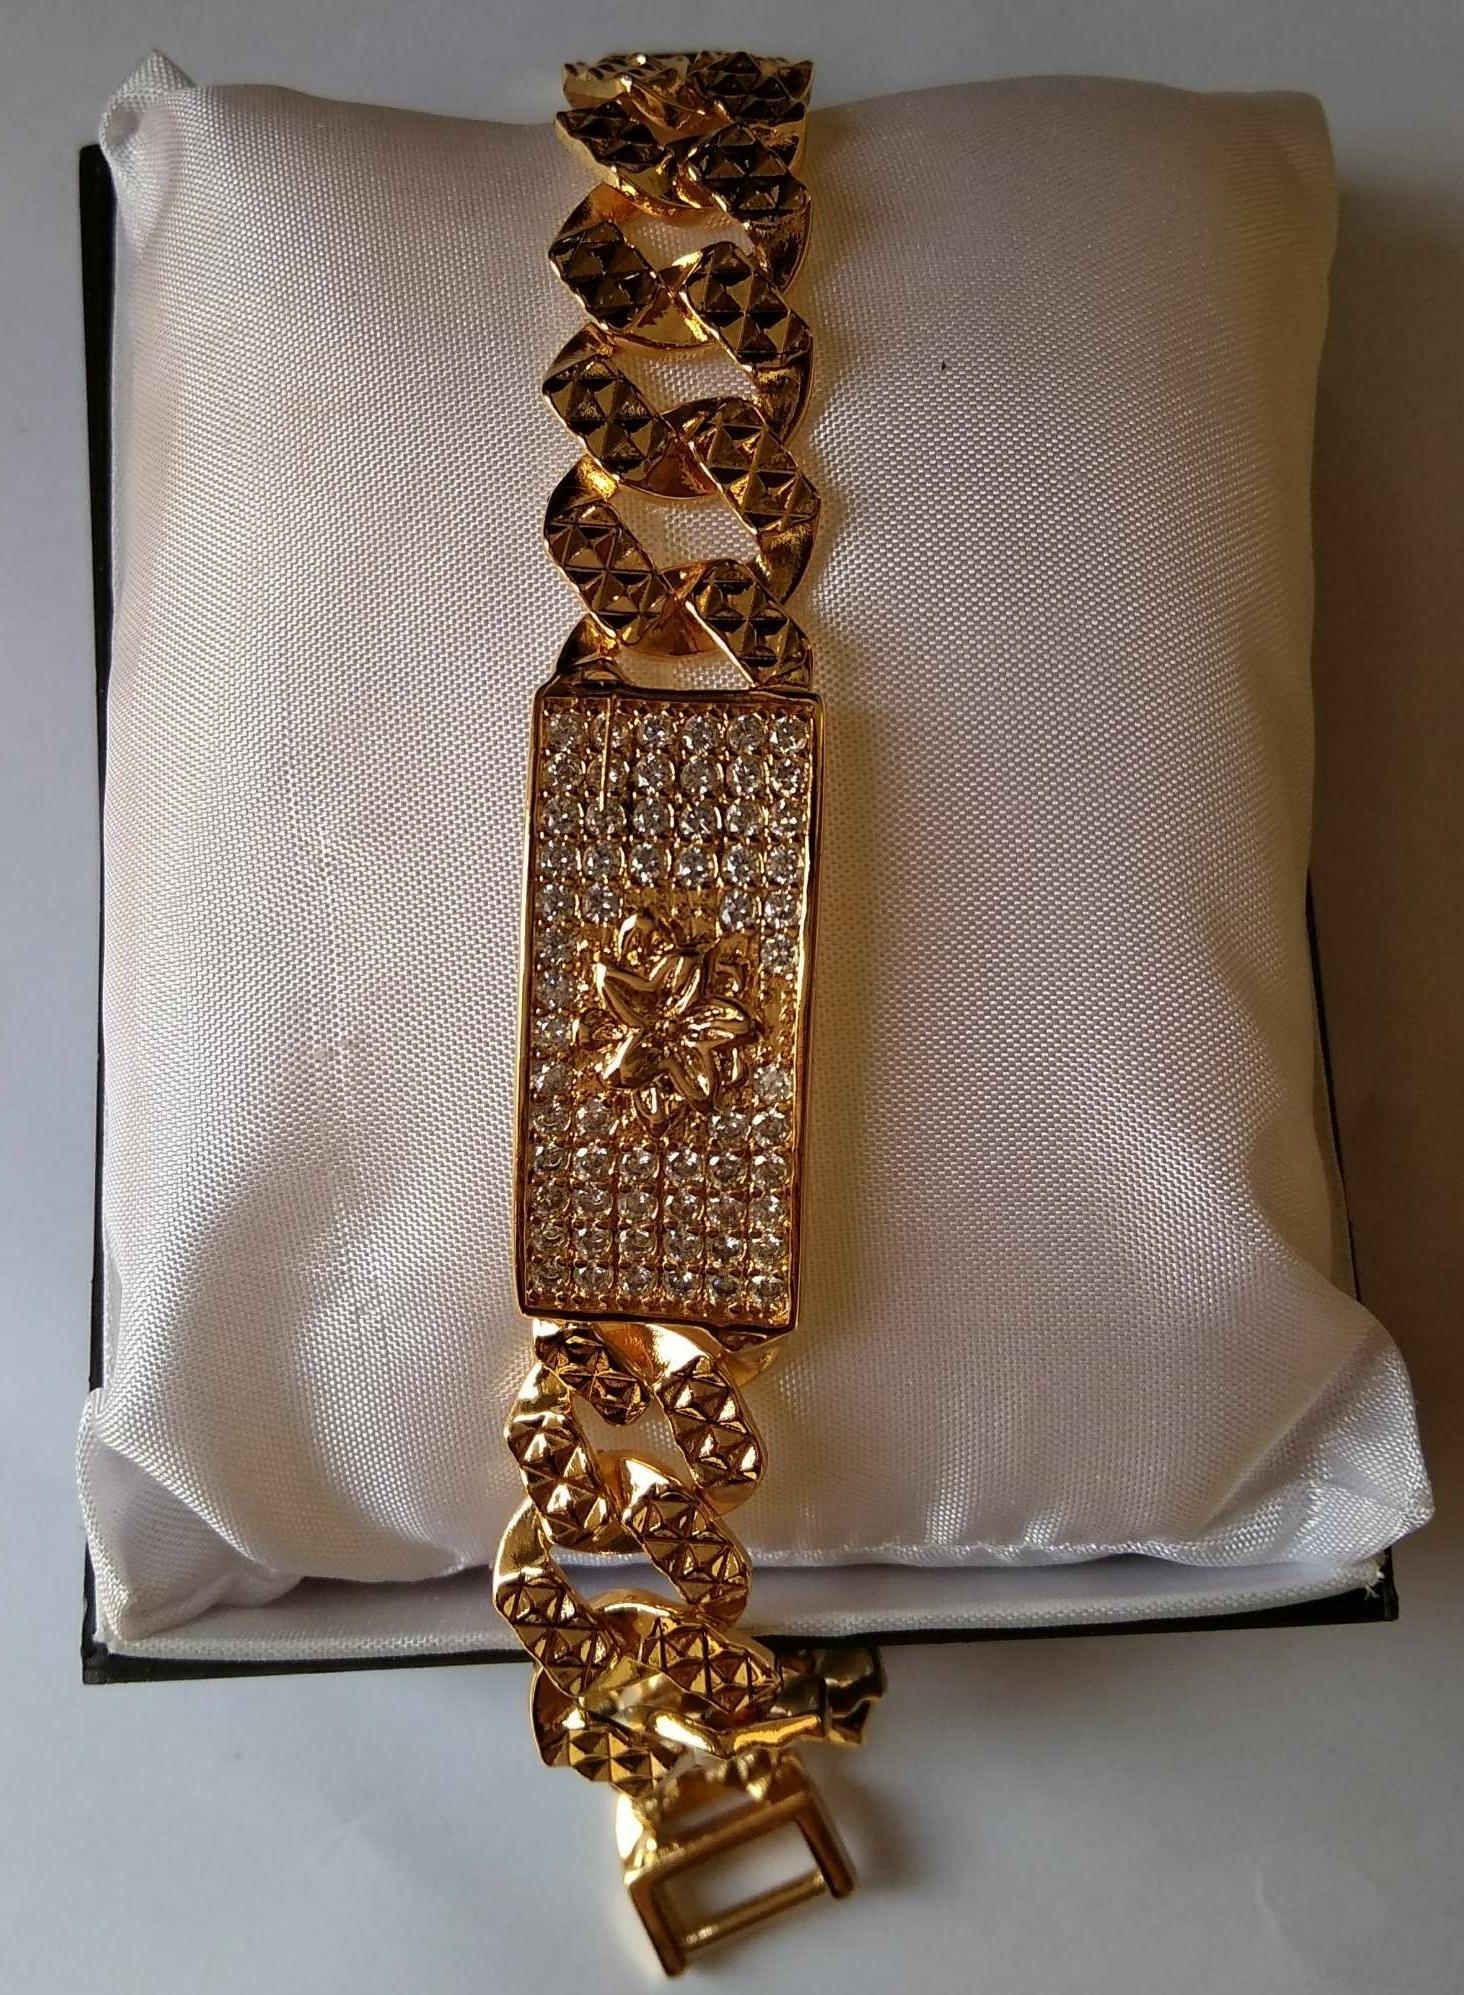 2016 Baru Jam Gelang Wanita Perhiasan Emas Update Daftar Tiaria Fluttering Butterfly Bracelet Berlian Xuping Cantik Motif Tengah Berlapis Gold